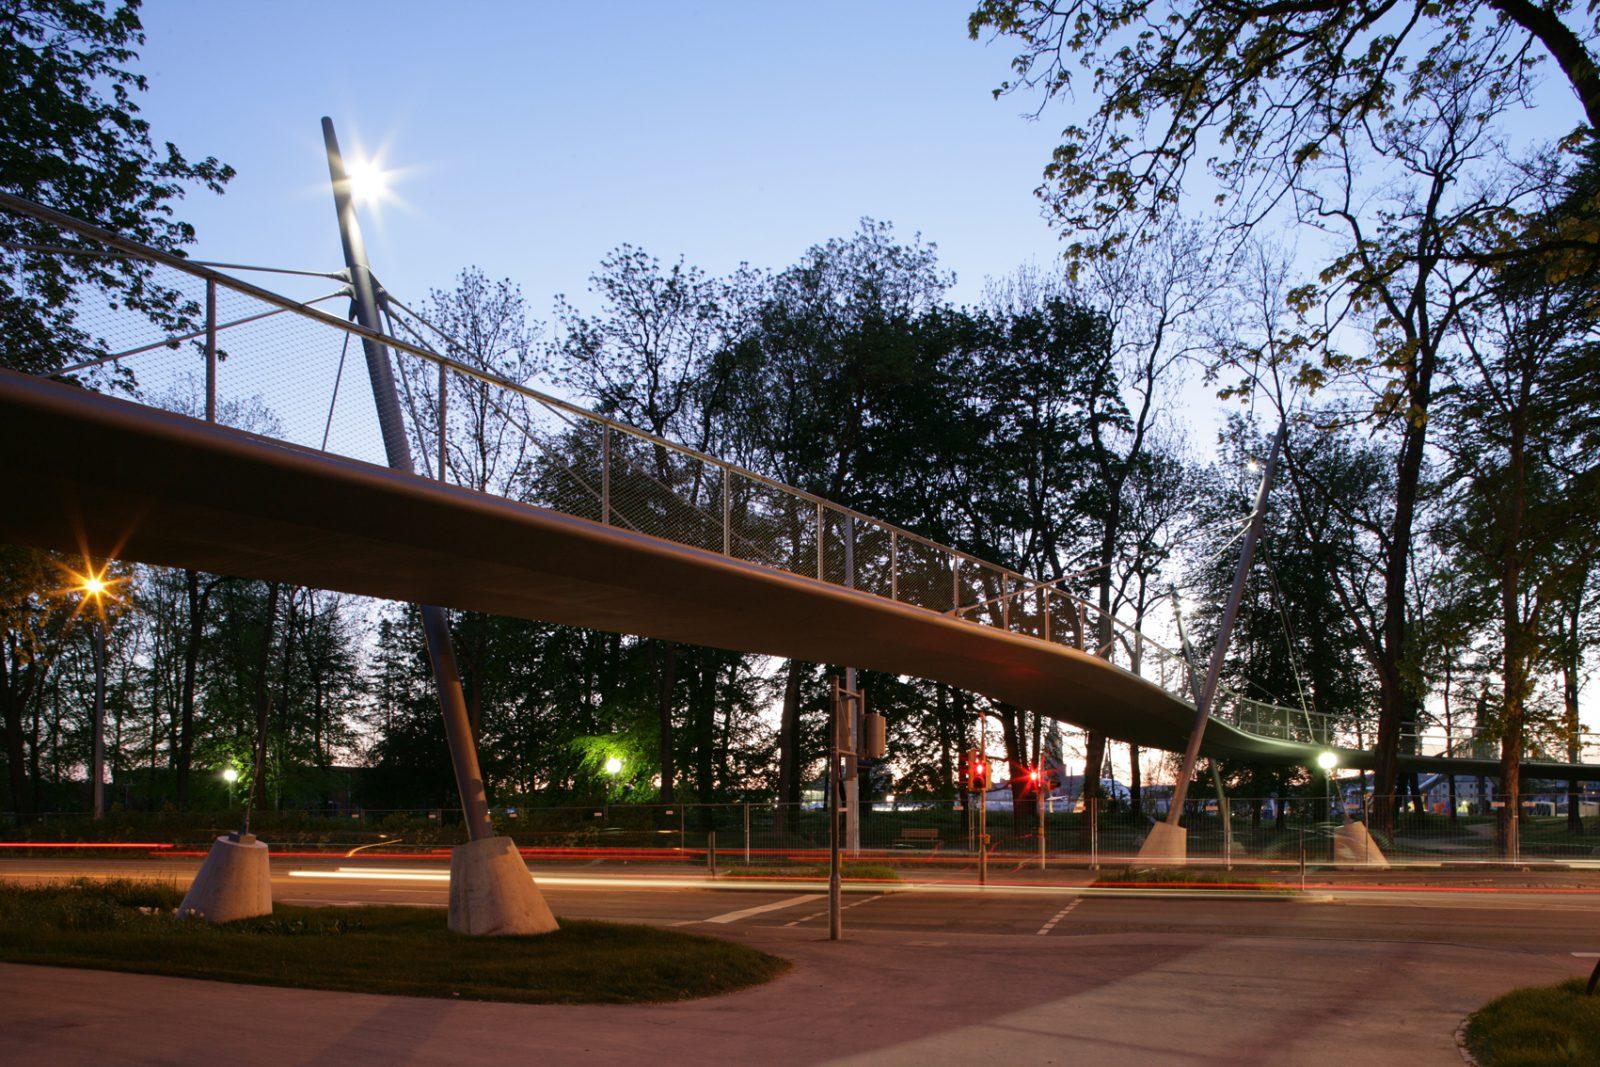 Fuß- und Radwegbrücke über die Ringstraße, Neu-Ulm